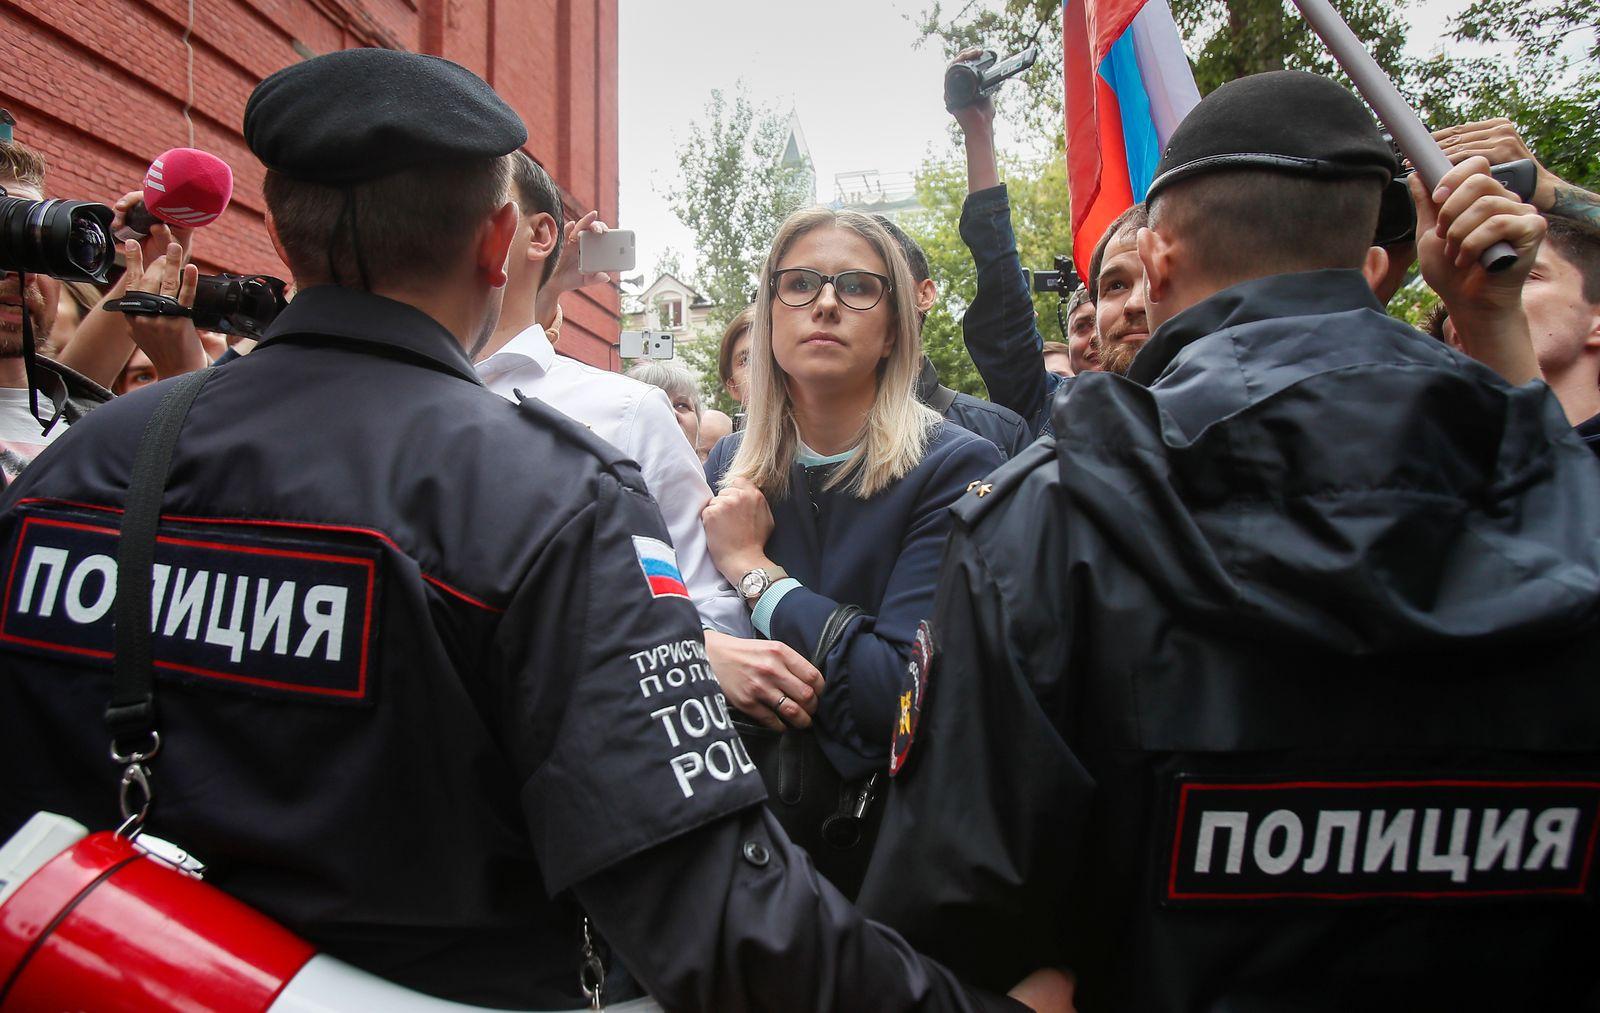 Lubow Sobel/ Russland / Wahlen / September 2019 / Moskau